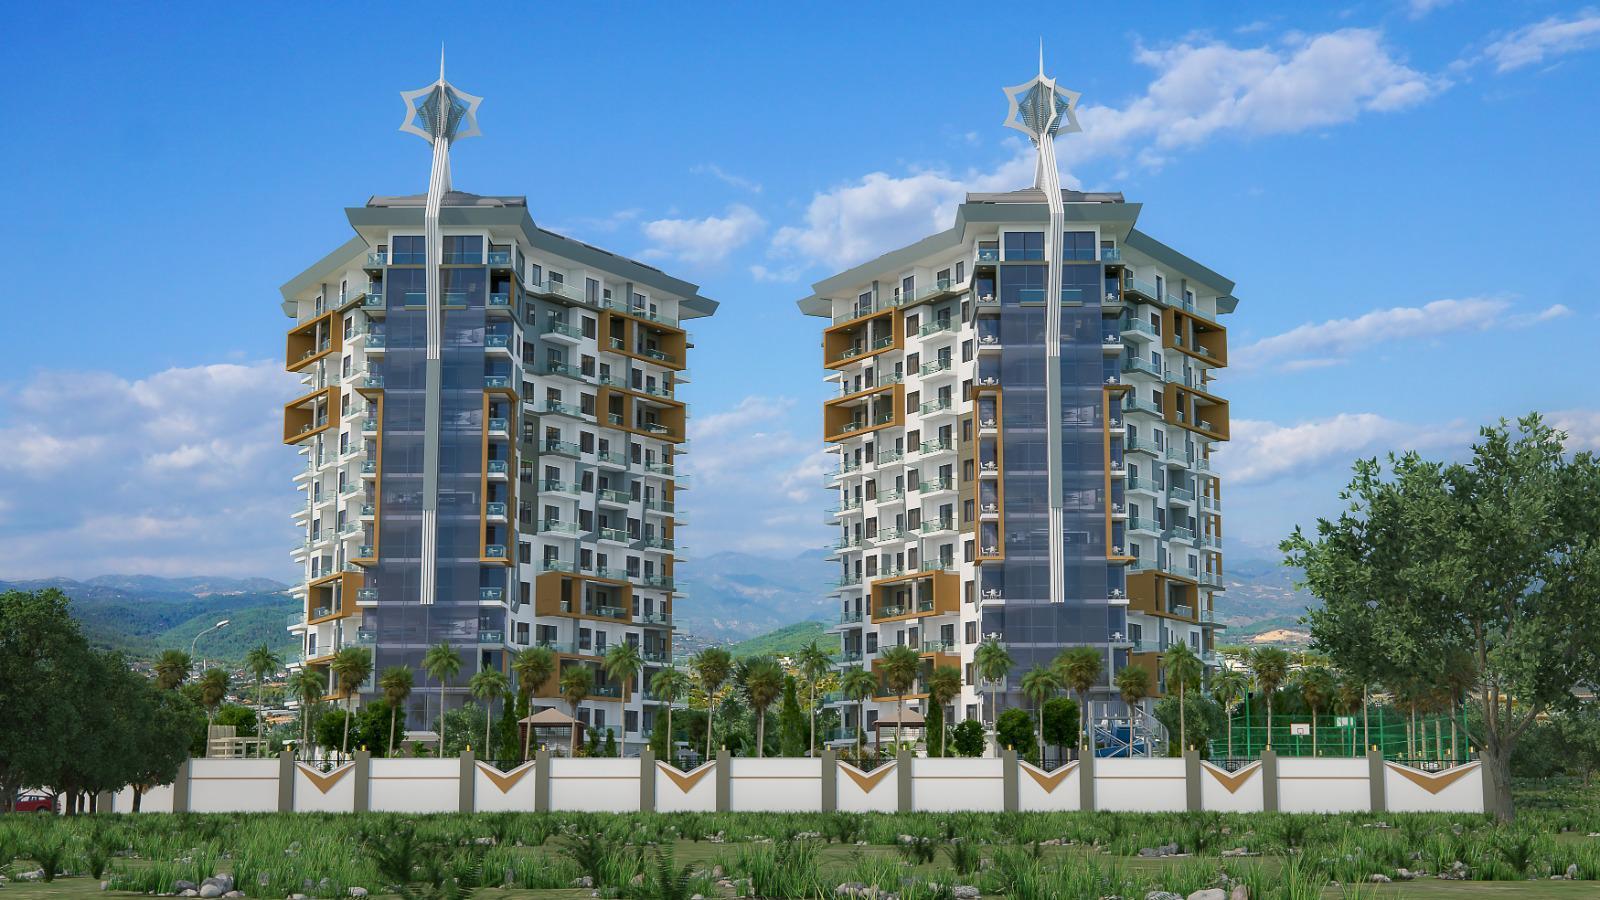 Квартиры и пентхаусы в комплексе с богатой инфраструктурой район Махмутлар - Фото 3